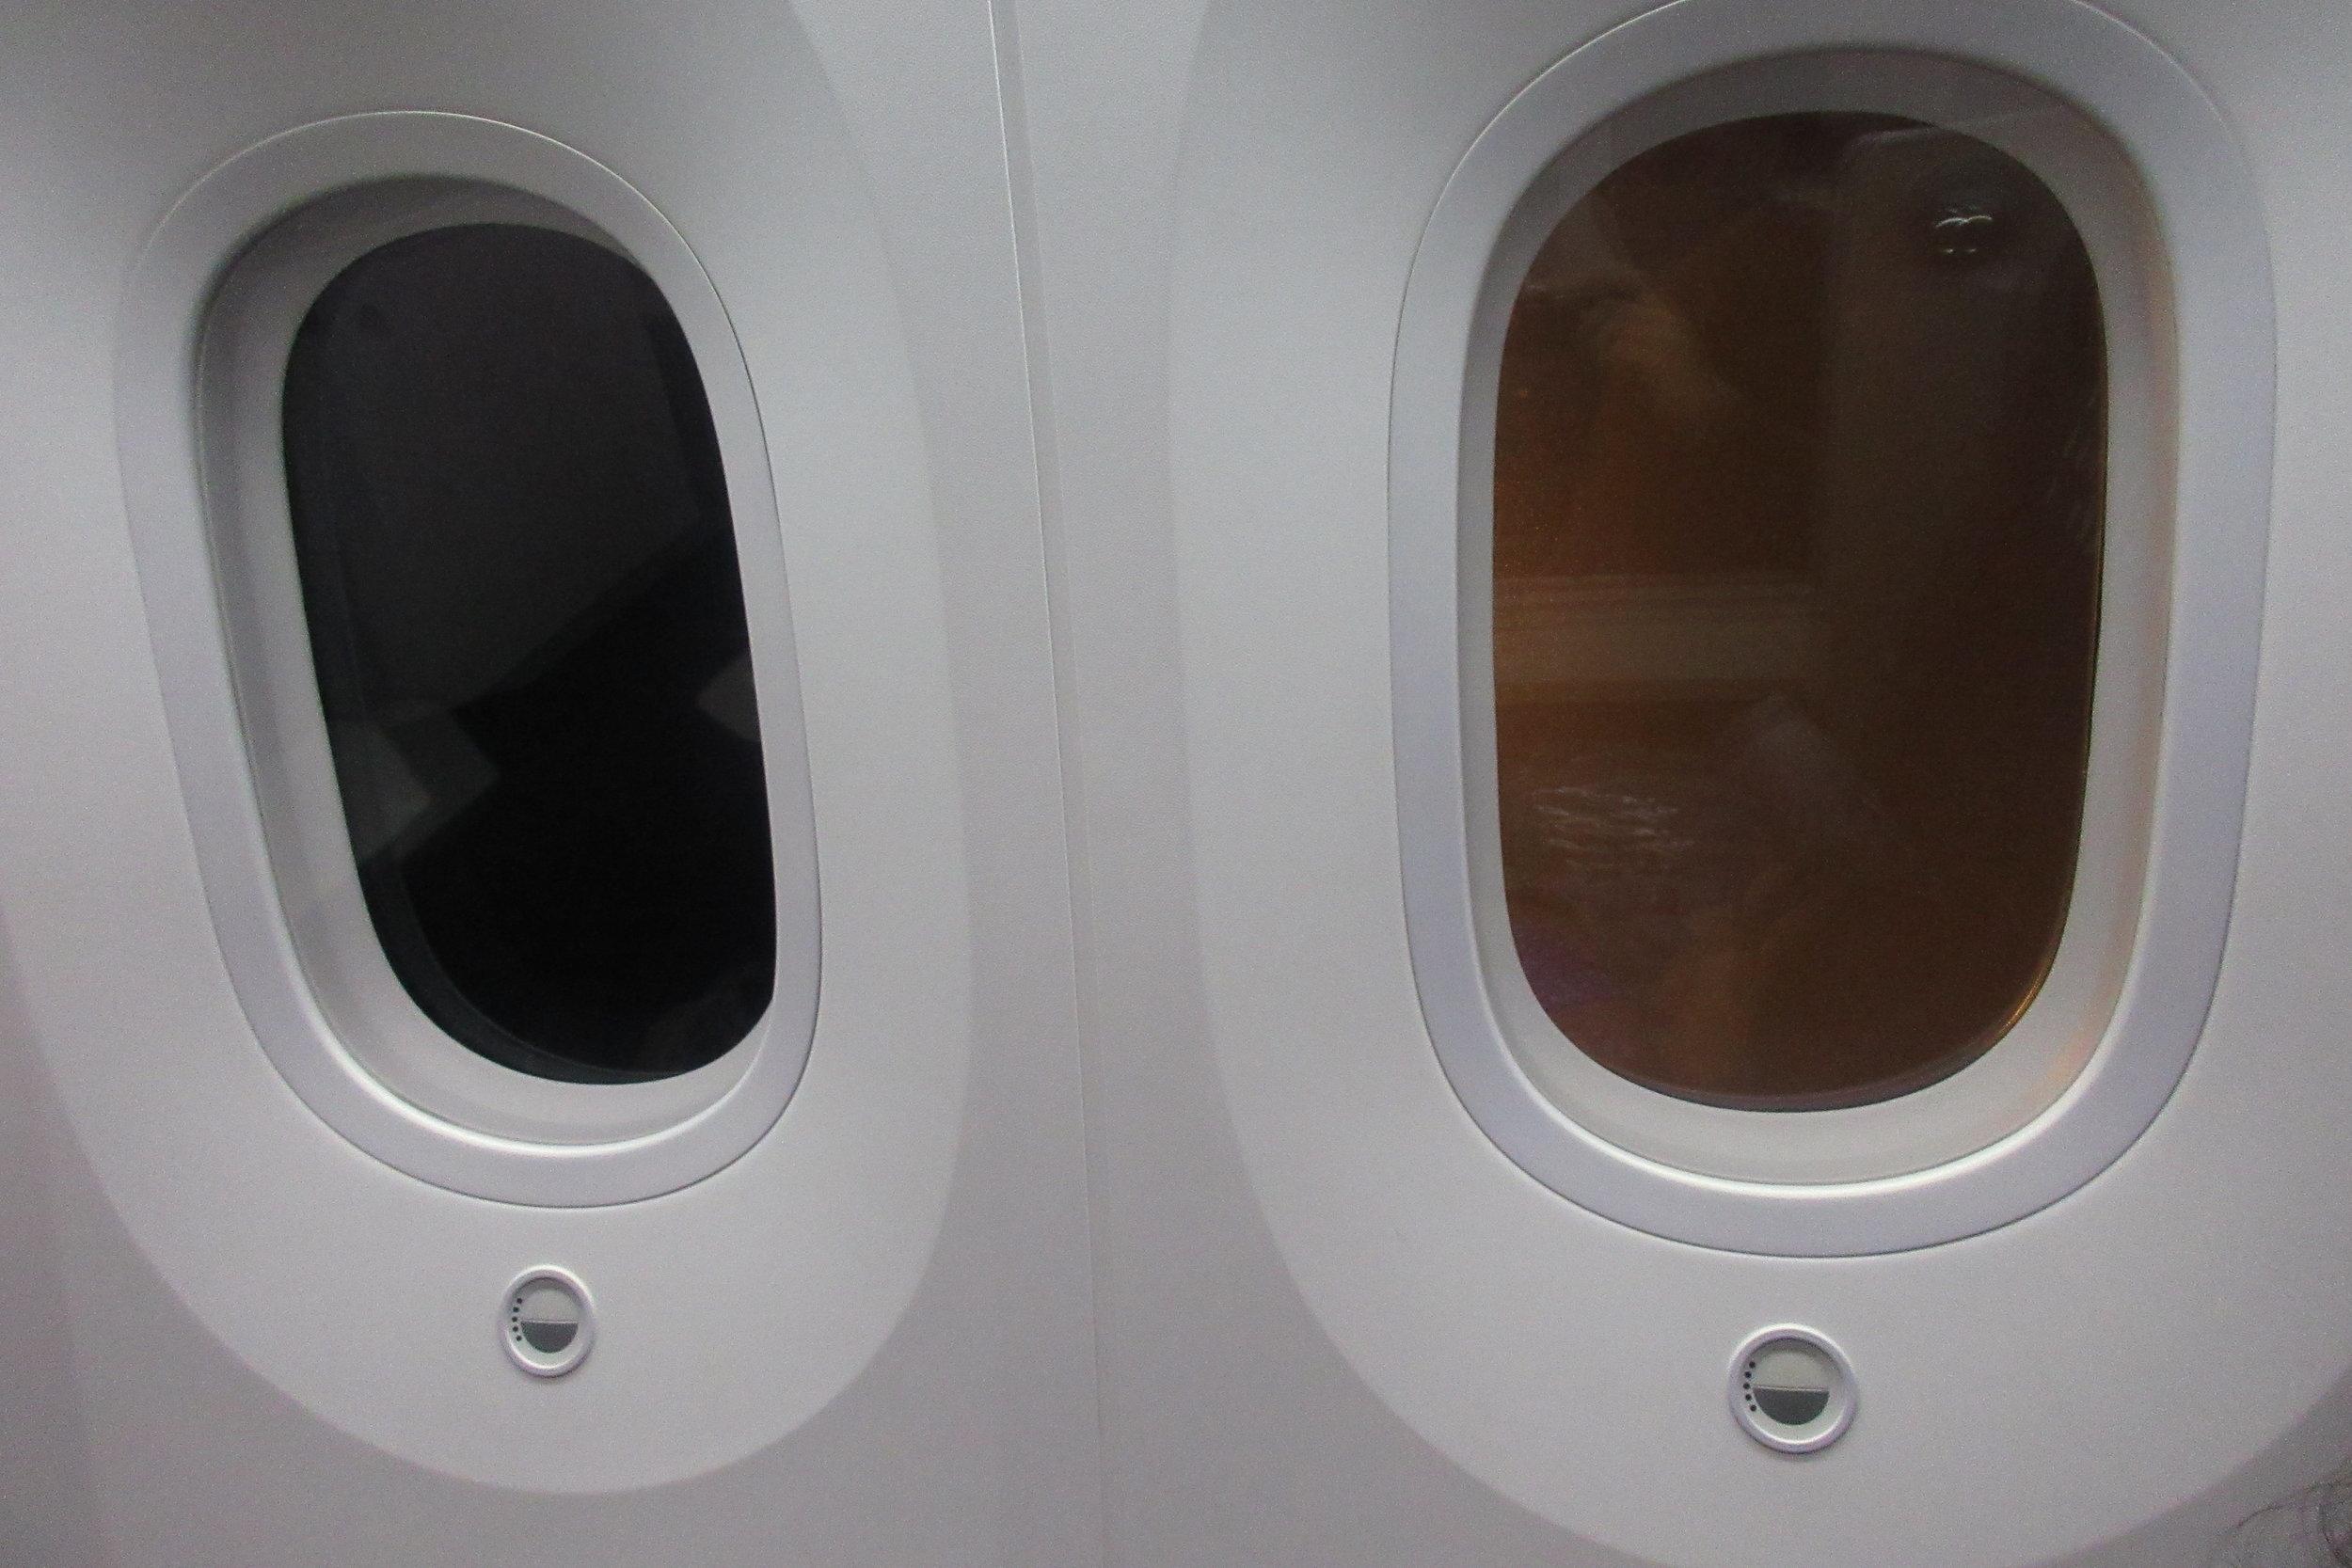 Japan Airlines business class – Window brightness controls